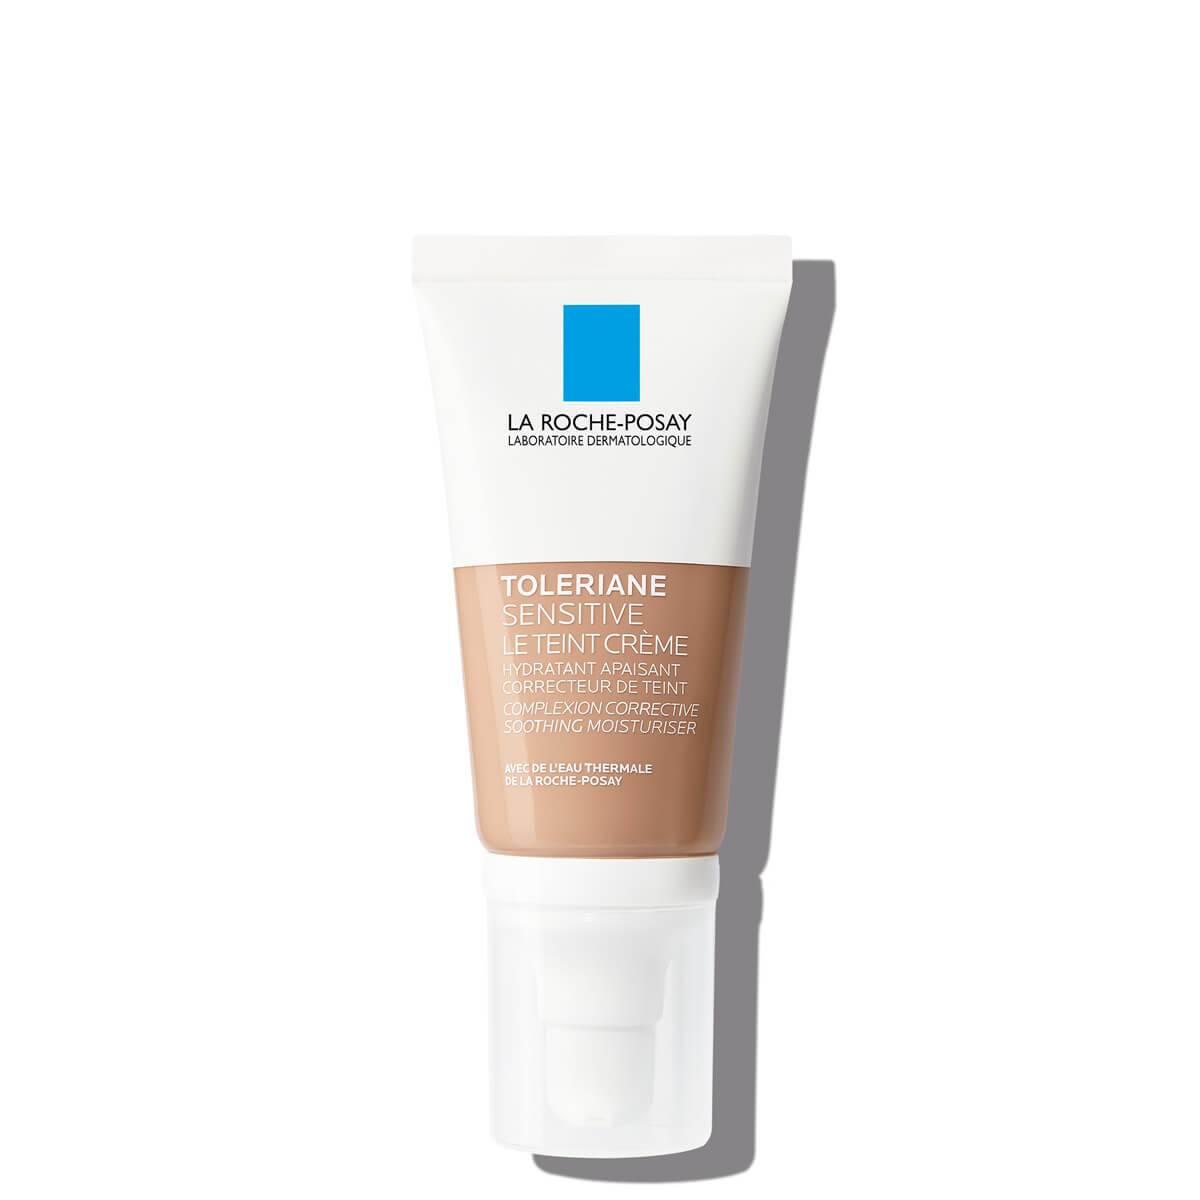 LaRochePosay-Product-Allergic-Toleriane-SensitiveLeTeint-50ml-3337875678636-FSS